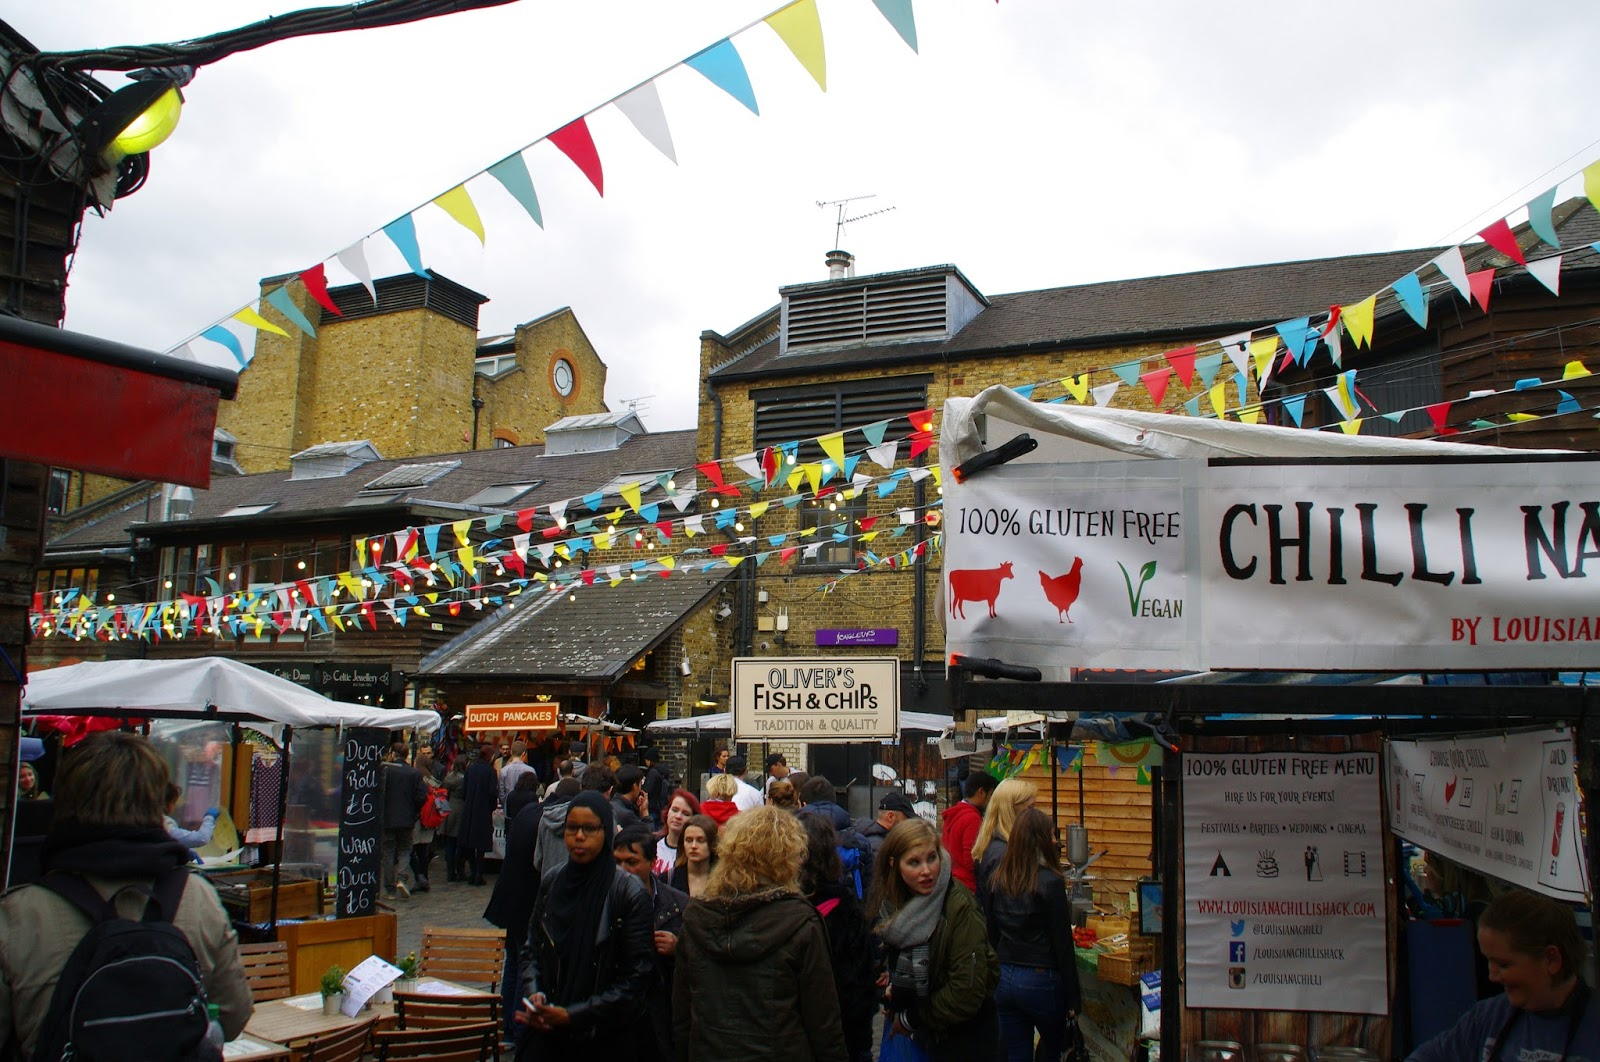 Camden Lock Markets London